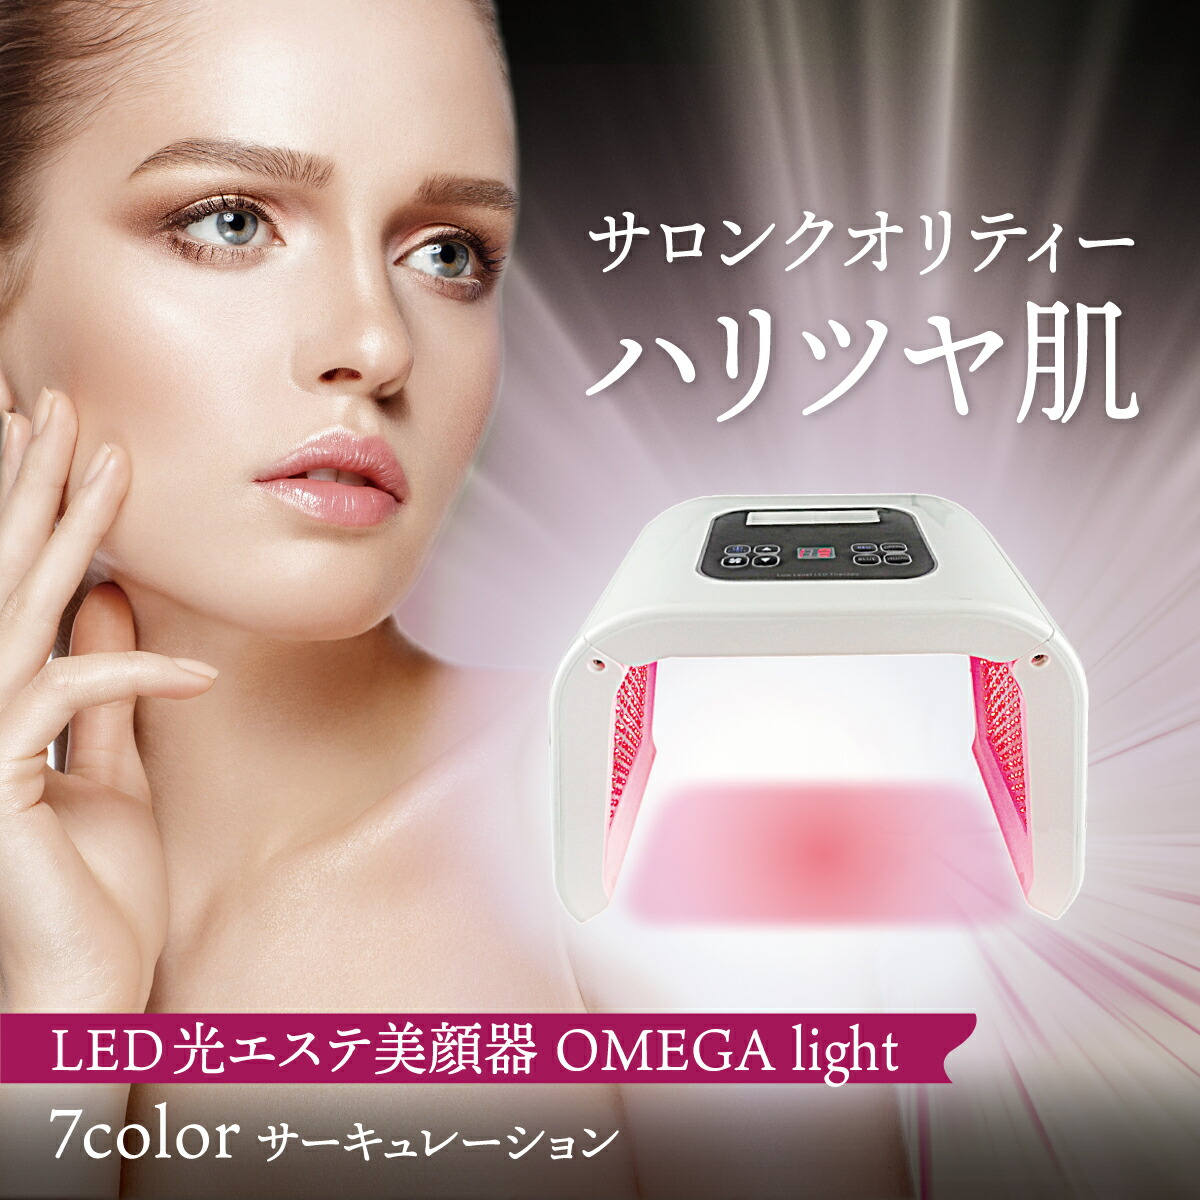 LED美顔器 美顔器 LED 美顔機 オメガライト 光美容器 ハリ ツヤ 美肌 シワ 小じわ たるみ コラーゲン 美顔 光エステ 家庭用LED美顔器 ニキビ 毛穴ケア ボディ